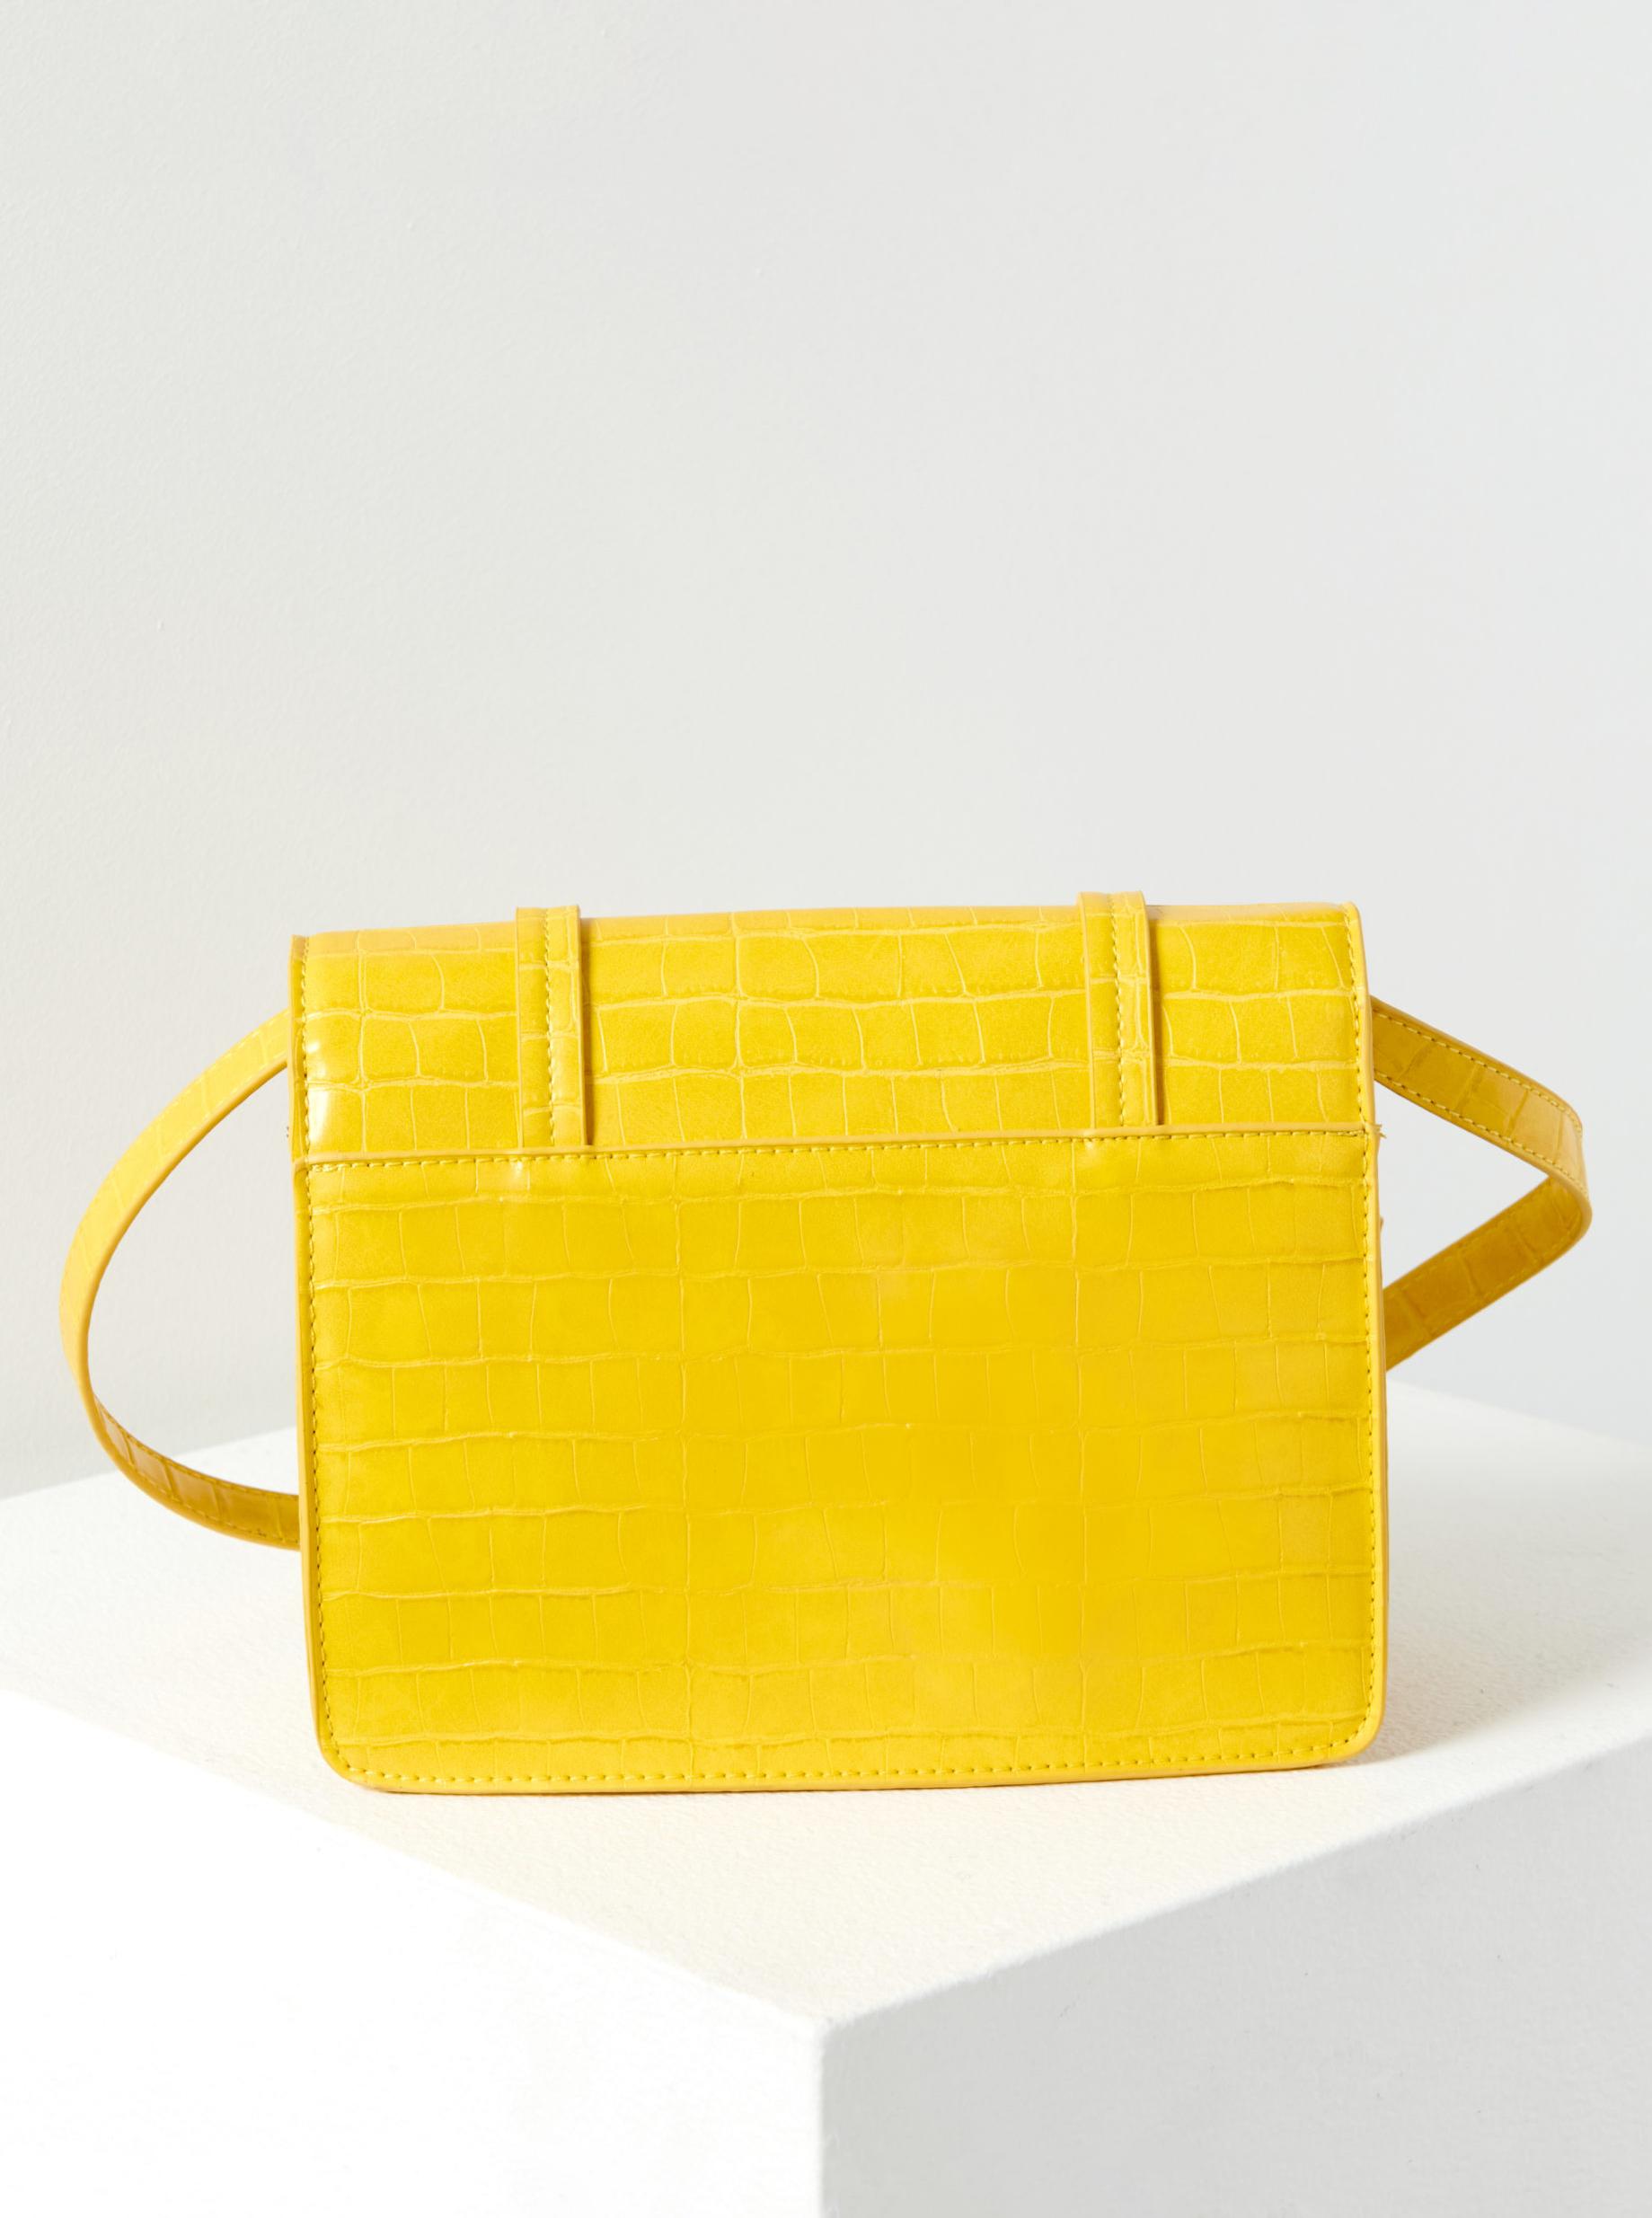 CAMAIEU Women's bag yellow